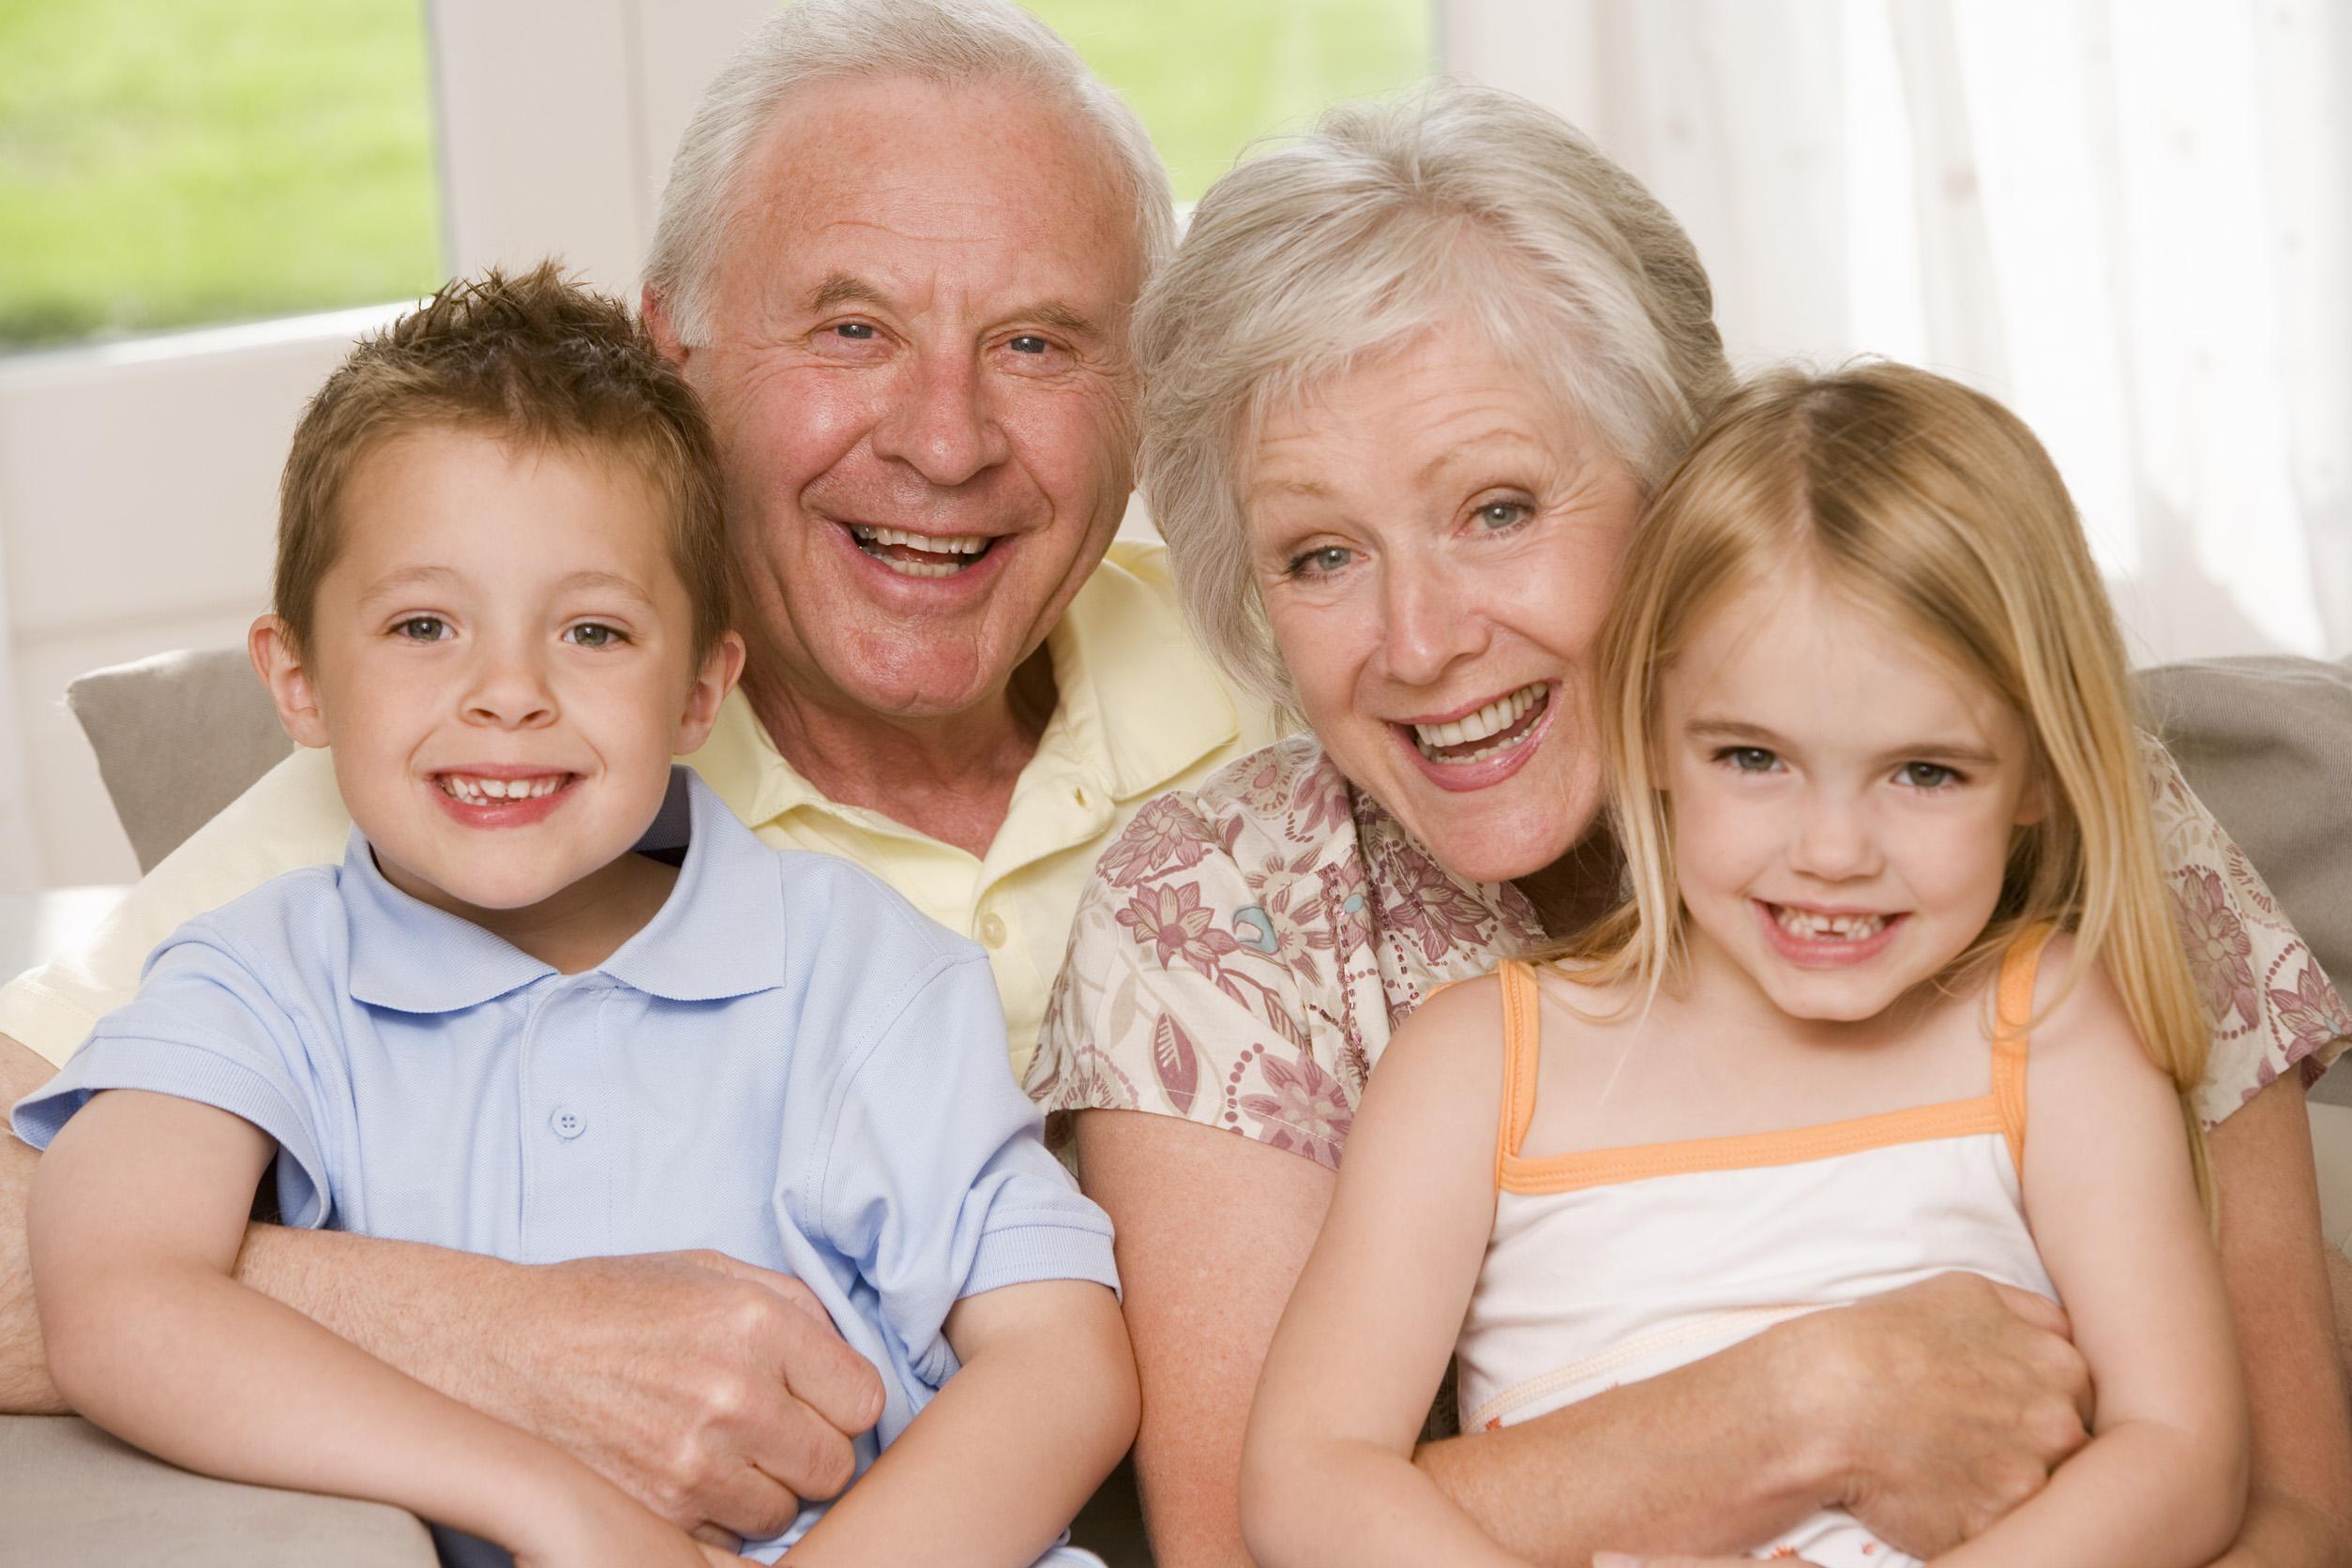 IMPALA - DEPARTAMENTO DE DIREITOS - ARQUIVO IMPALA - TODAS AS REVISTAS - ROYALTY FREE – FAMILIA children, 80-89, years, boy, half-length, 75-80, embracing, grandchildren, people, caucasian, gray, adults, smiling, portrait, grey, family, elderly, small, t